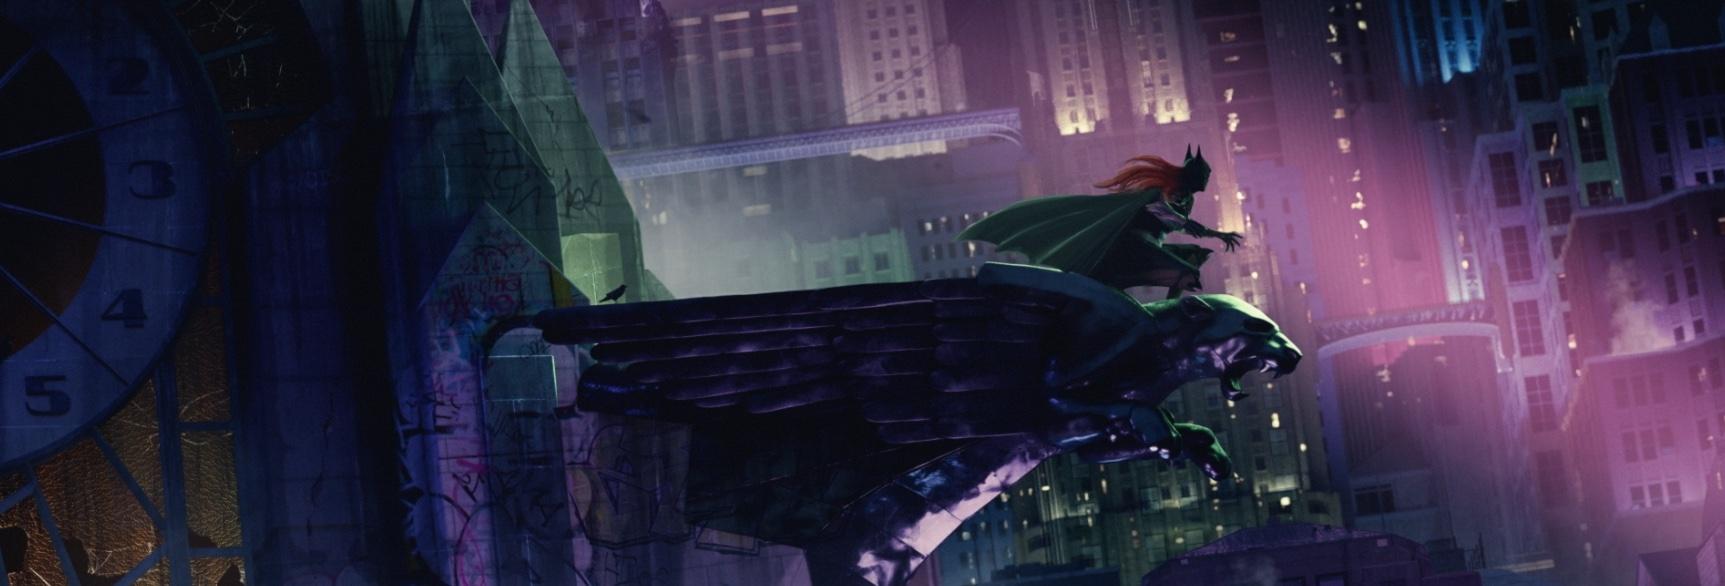 Batgirl movie concept art